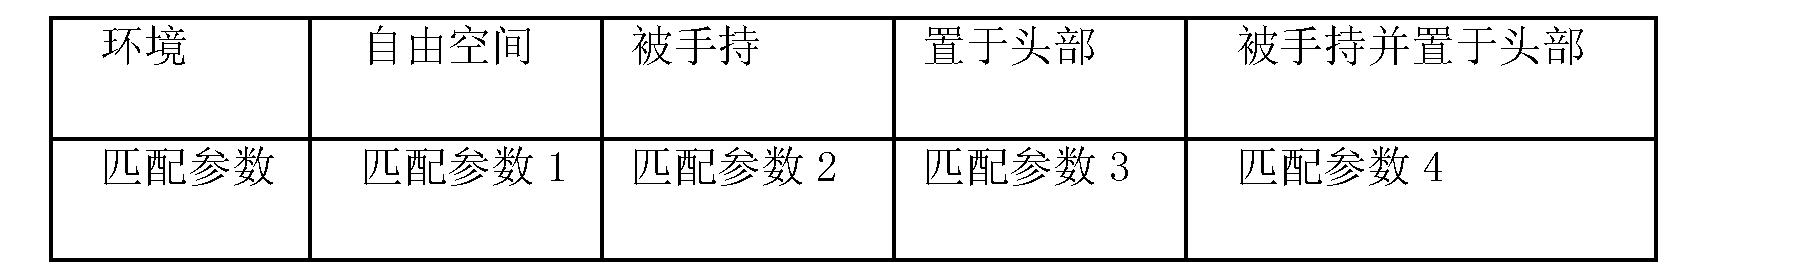 Figure CN102404015AD00091